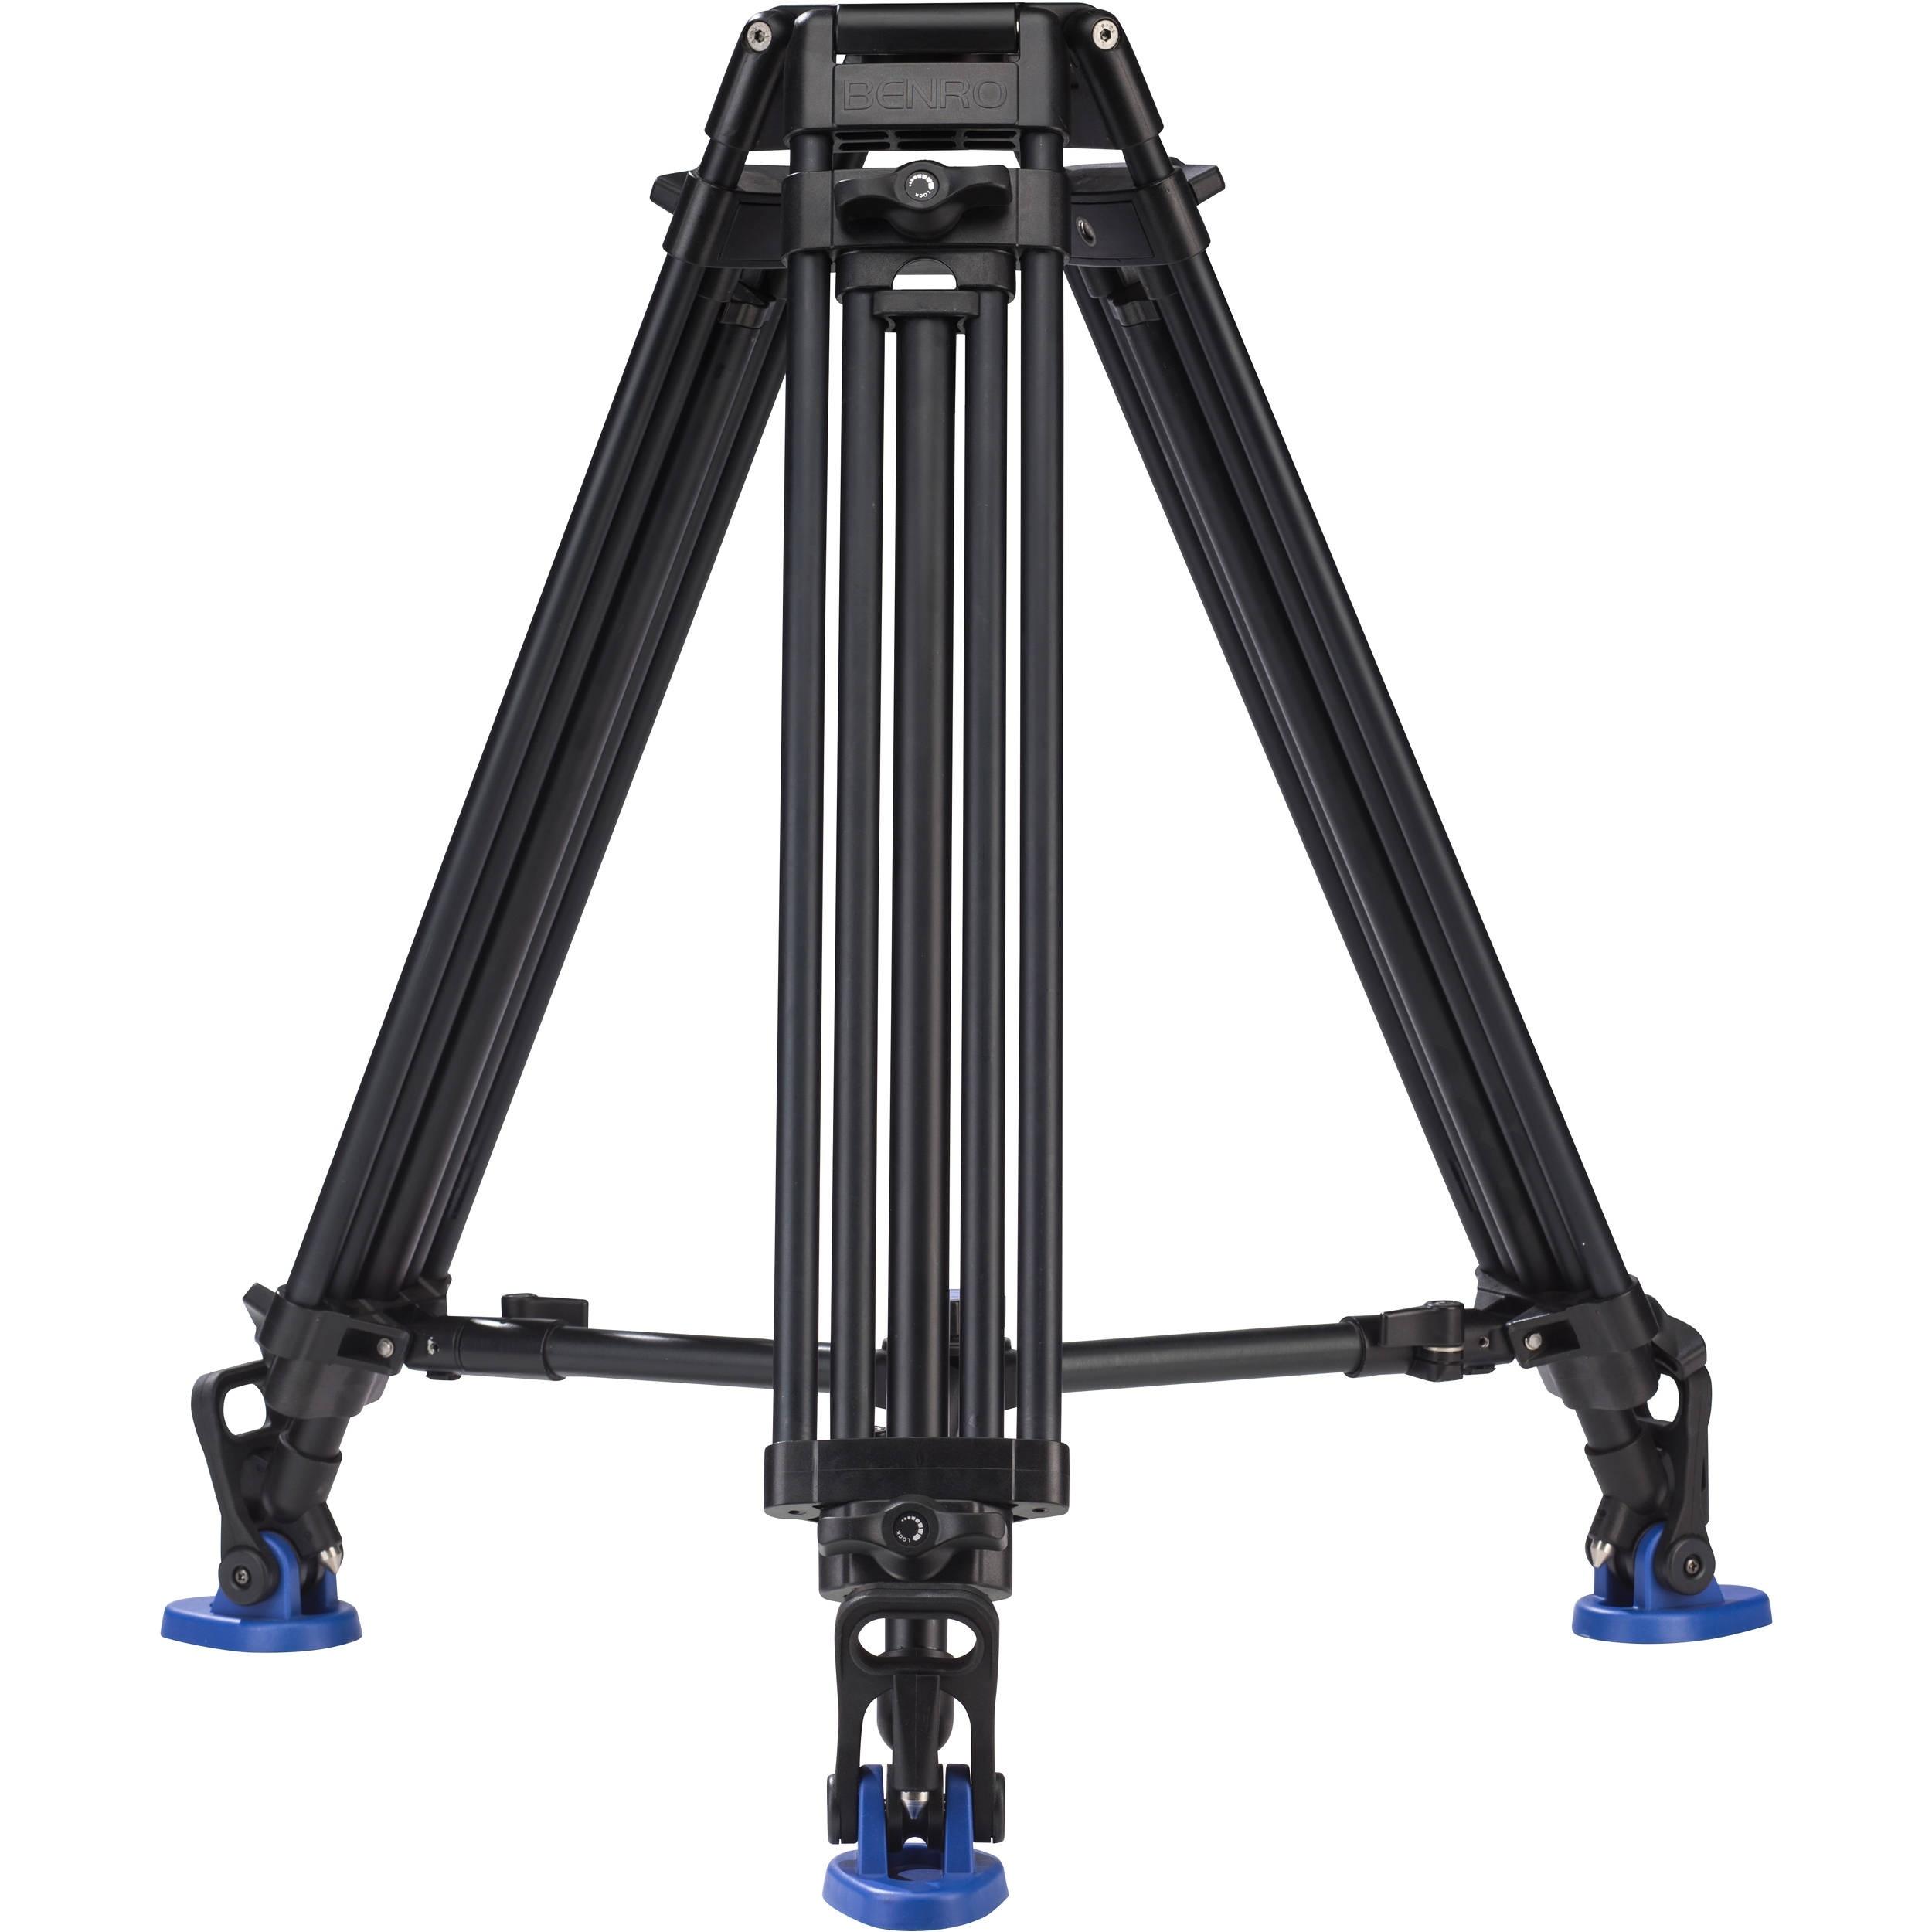 Benro A673TM Aluminium Tandem-Leg Video Tripod (75mm Bowl)